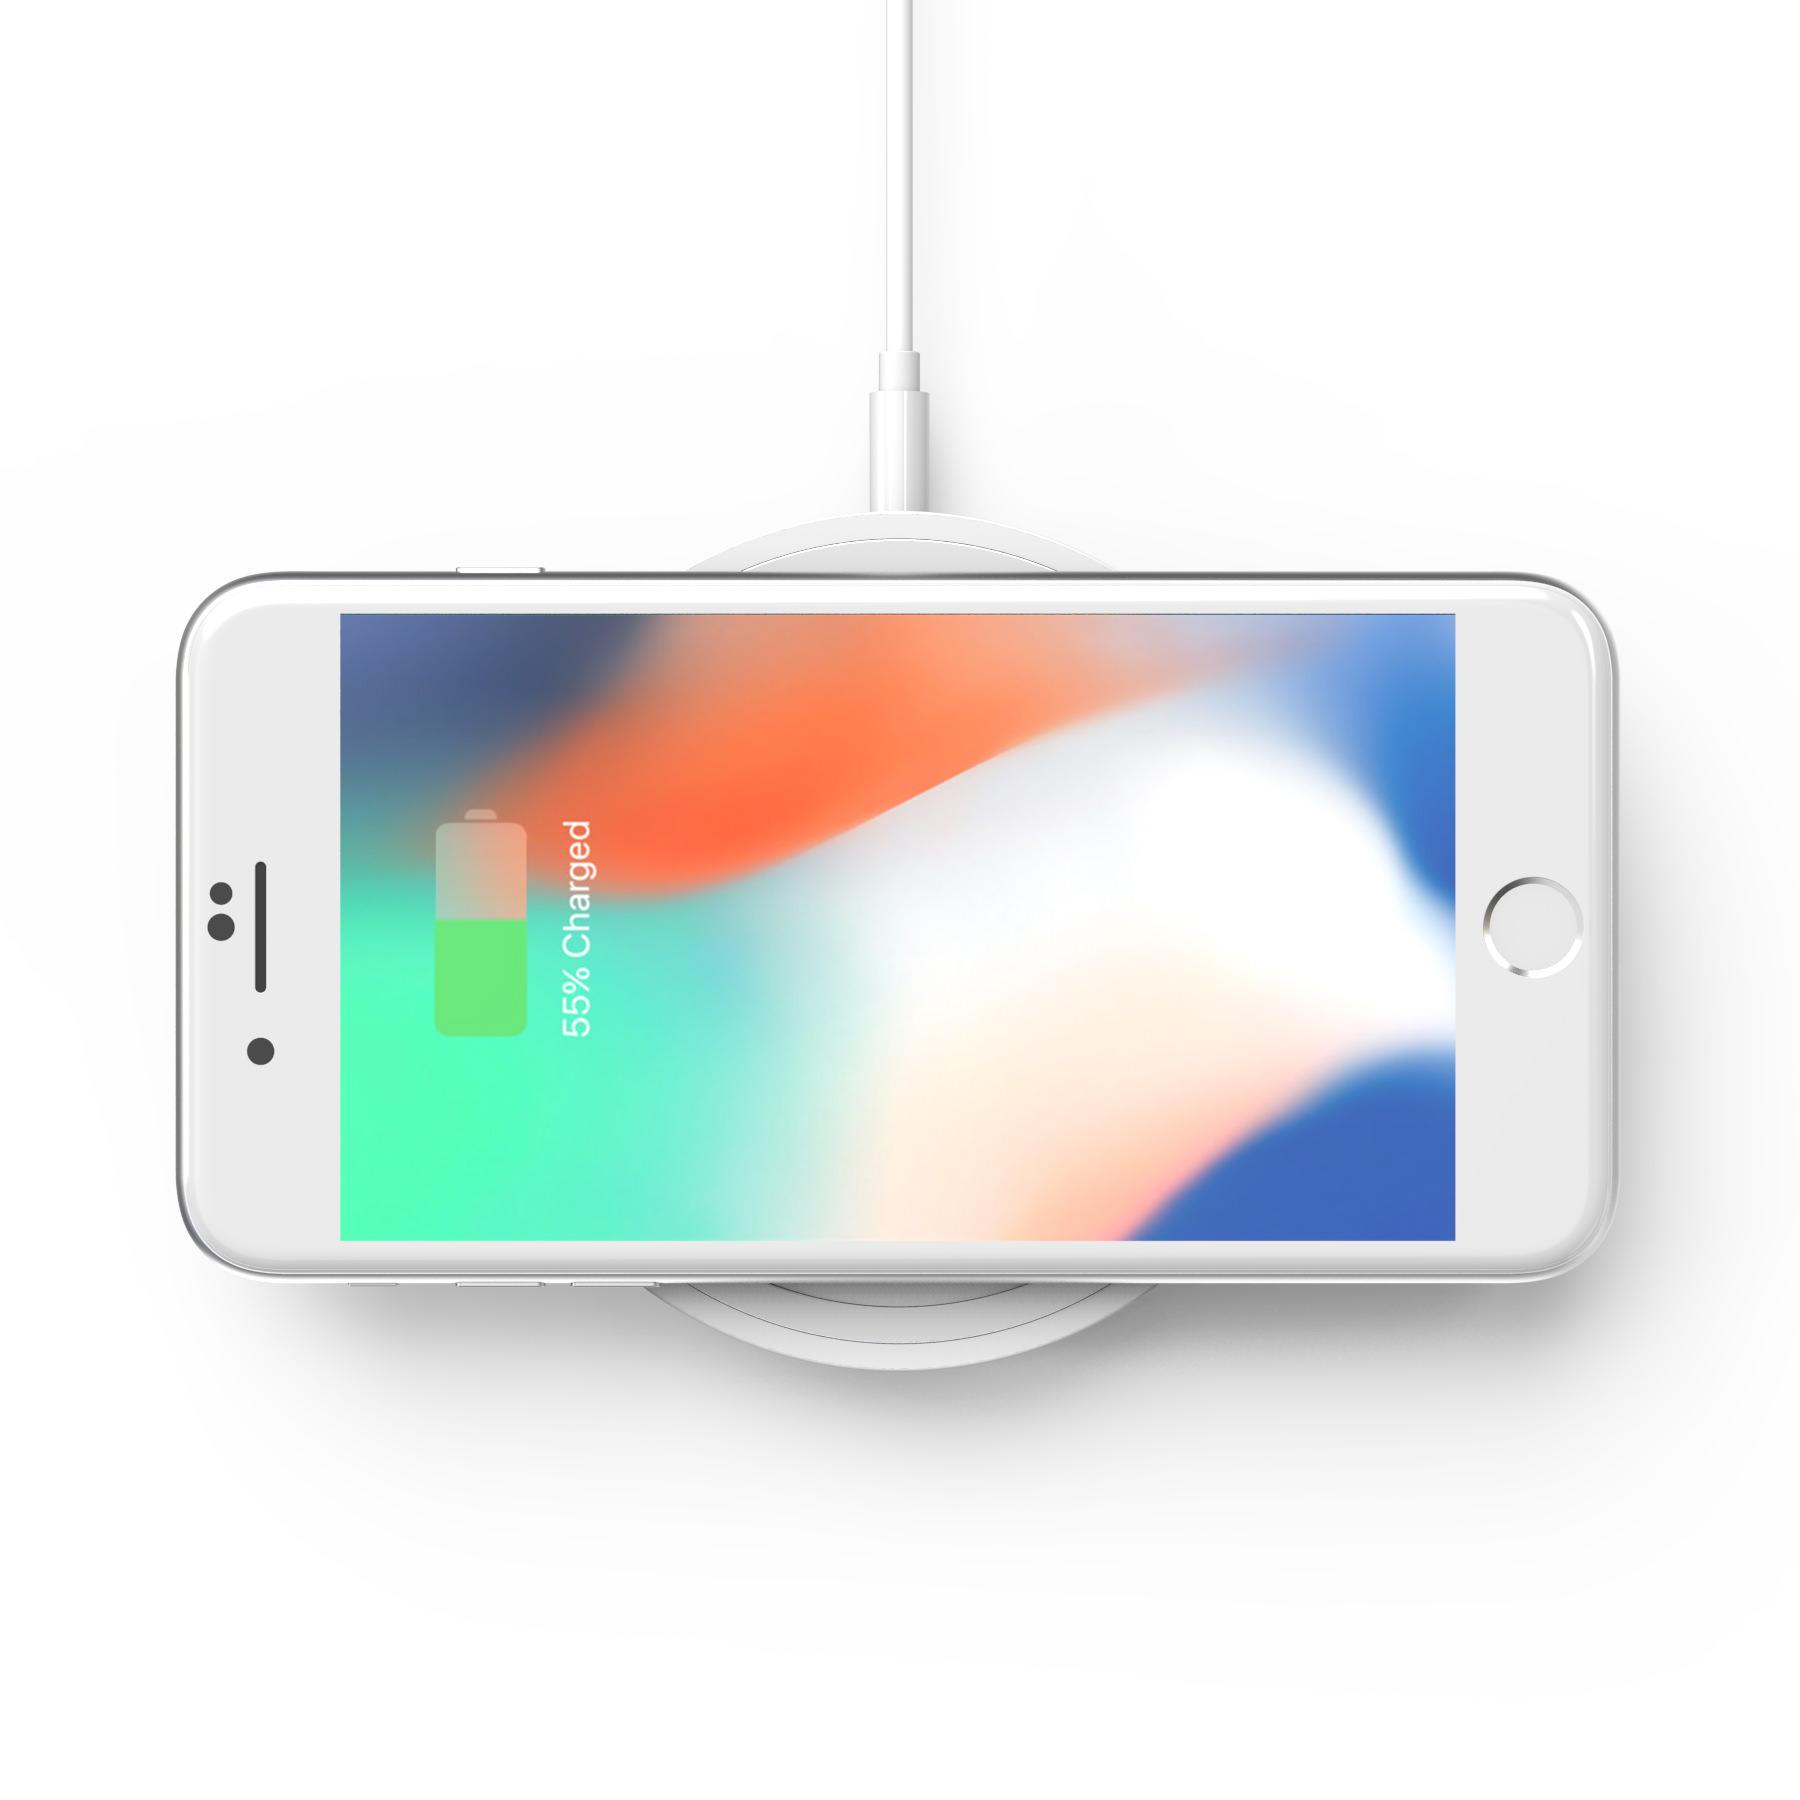 Bold_Charging_Pad_iPhone_5.jpg